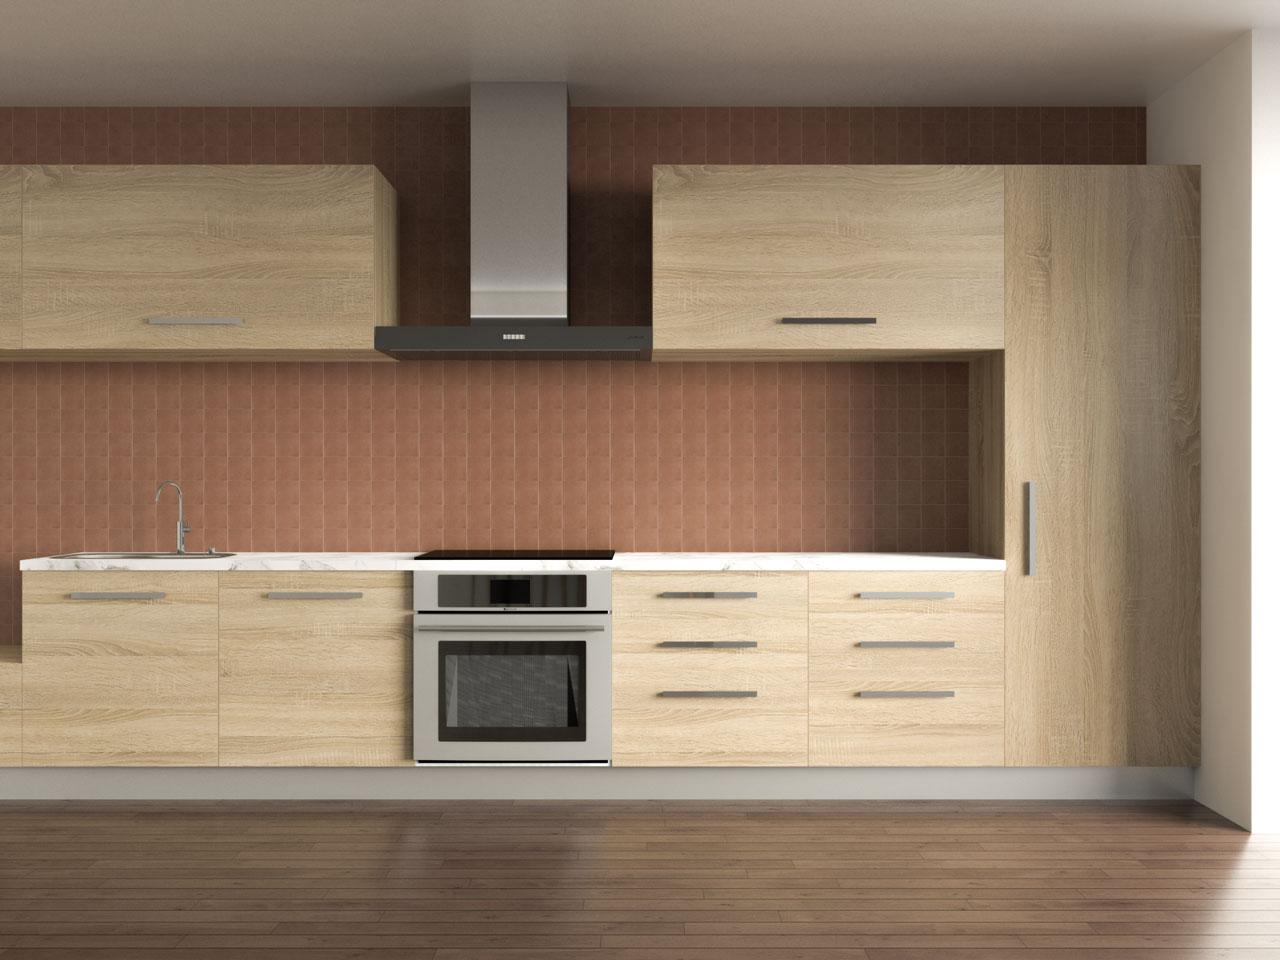 Chinese tea brown backsplash with oak kitchen cabinets